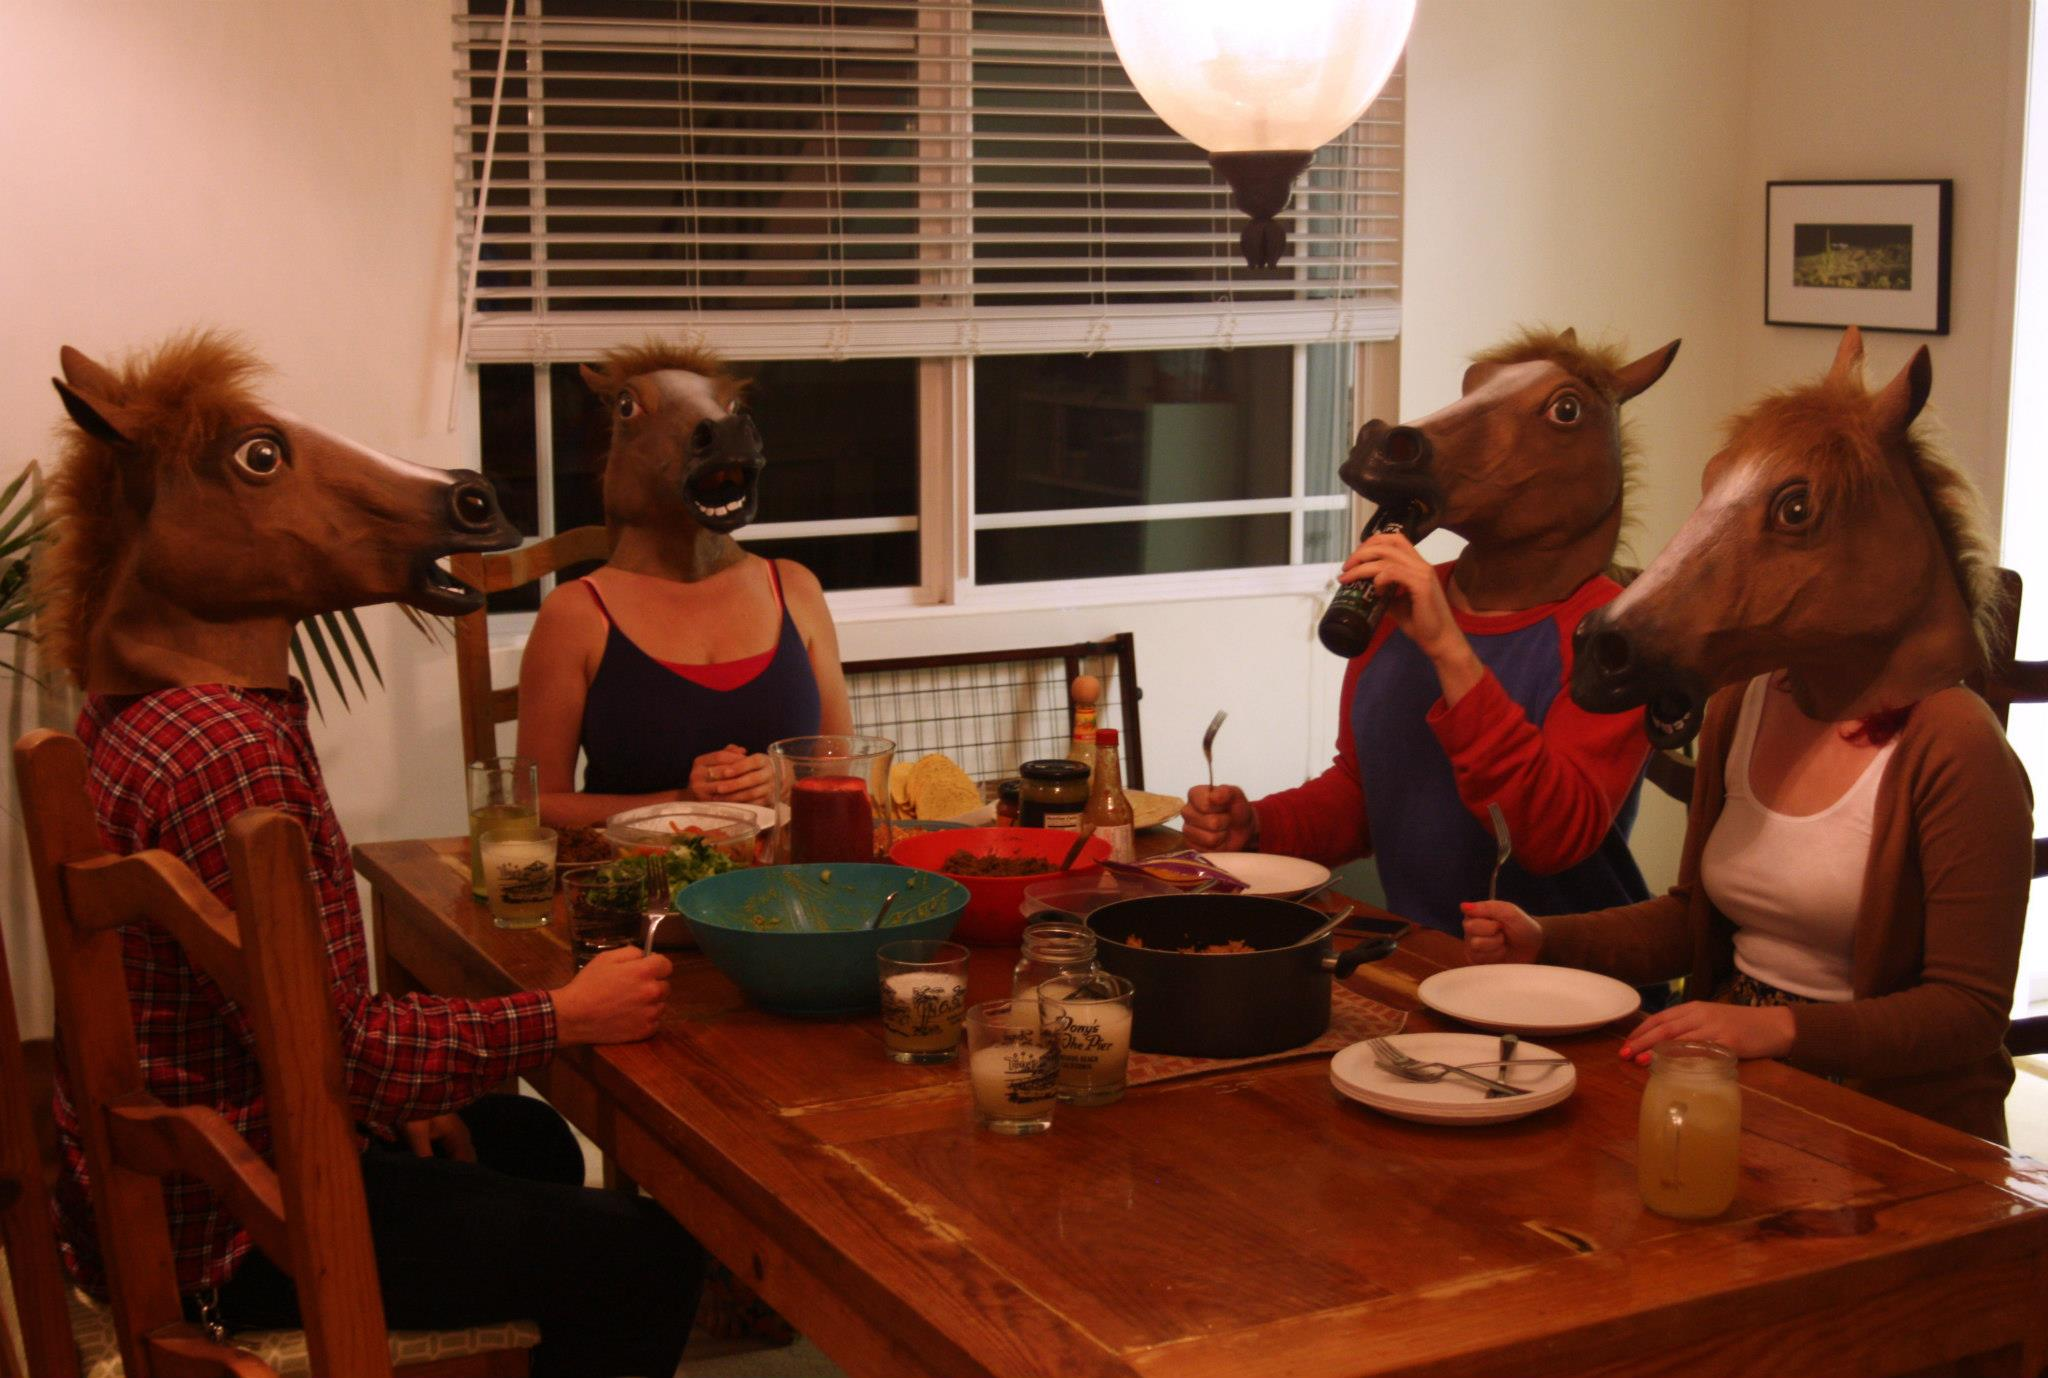 Horse Mask Headphones Hangovers